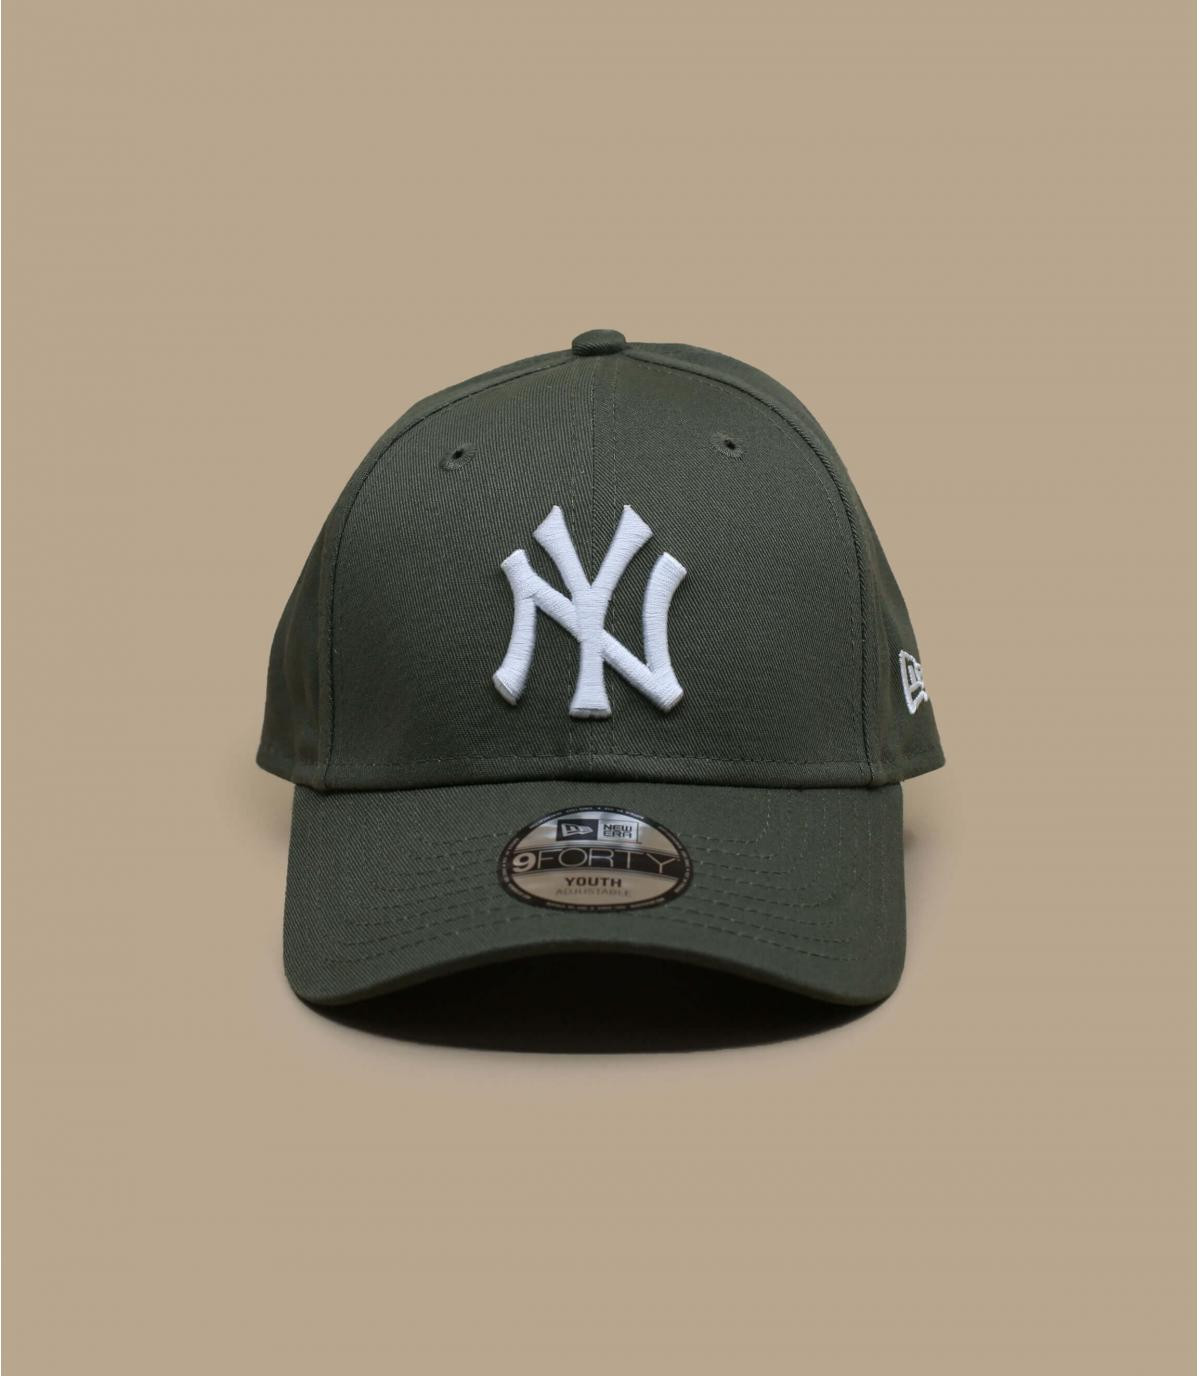 Kinder Cap grün NY